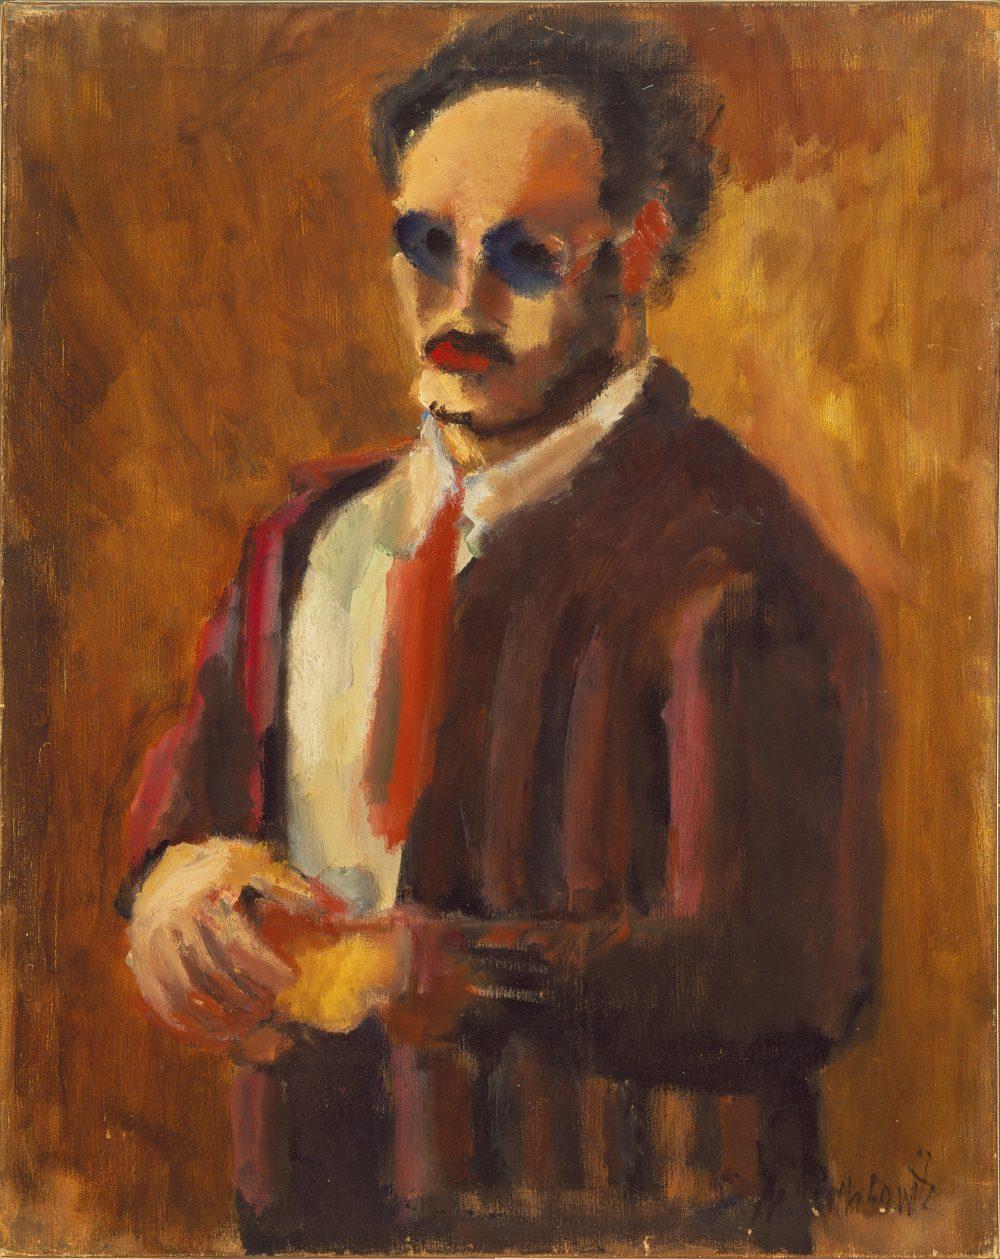 Mark Rothko Self-Portrait (c) 1998 Kate Rothko Prizel & Christopher Rothko/Bildrecht, Wien, 2019